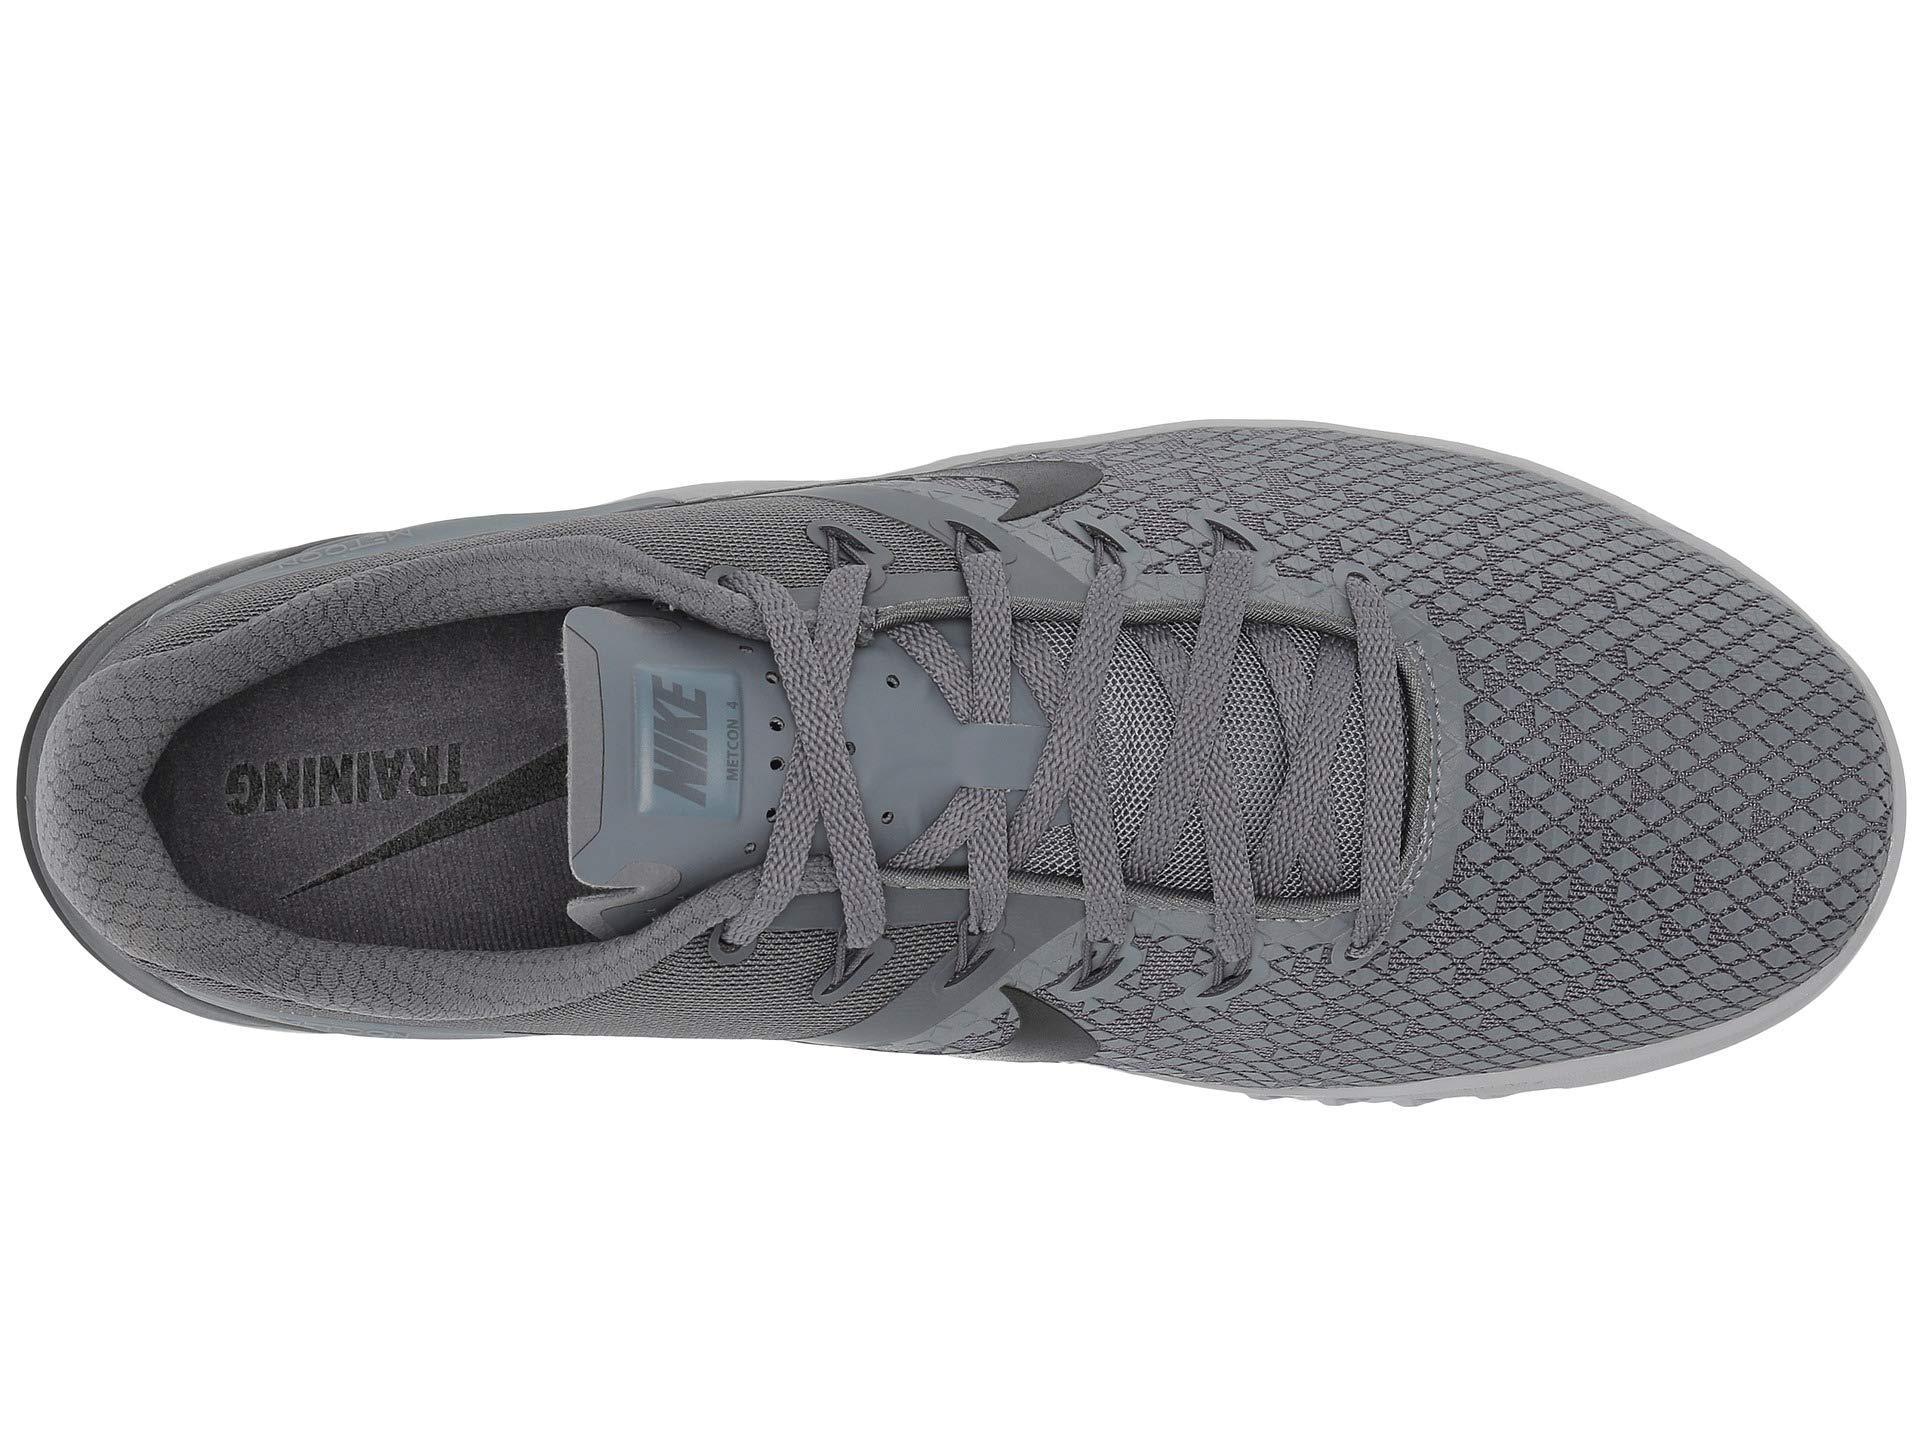 a081a5492 Nike Metcon 4 Xd (black wolf Grey anthracite white) Men s Cross ...